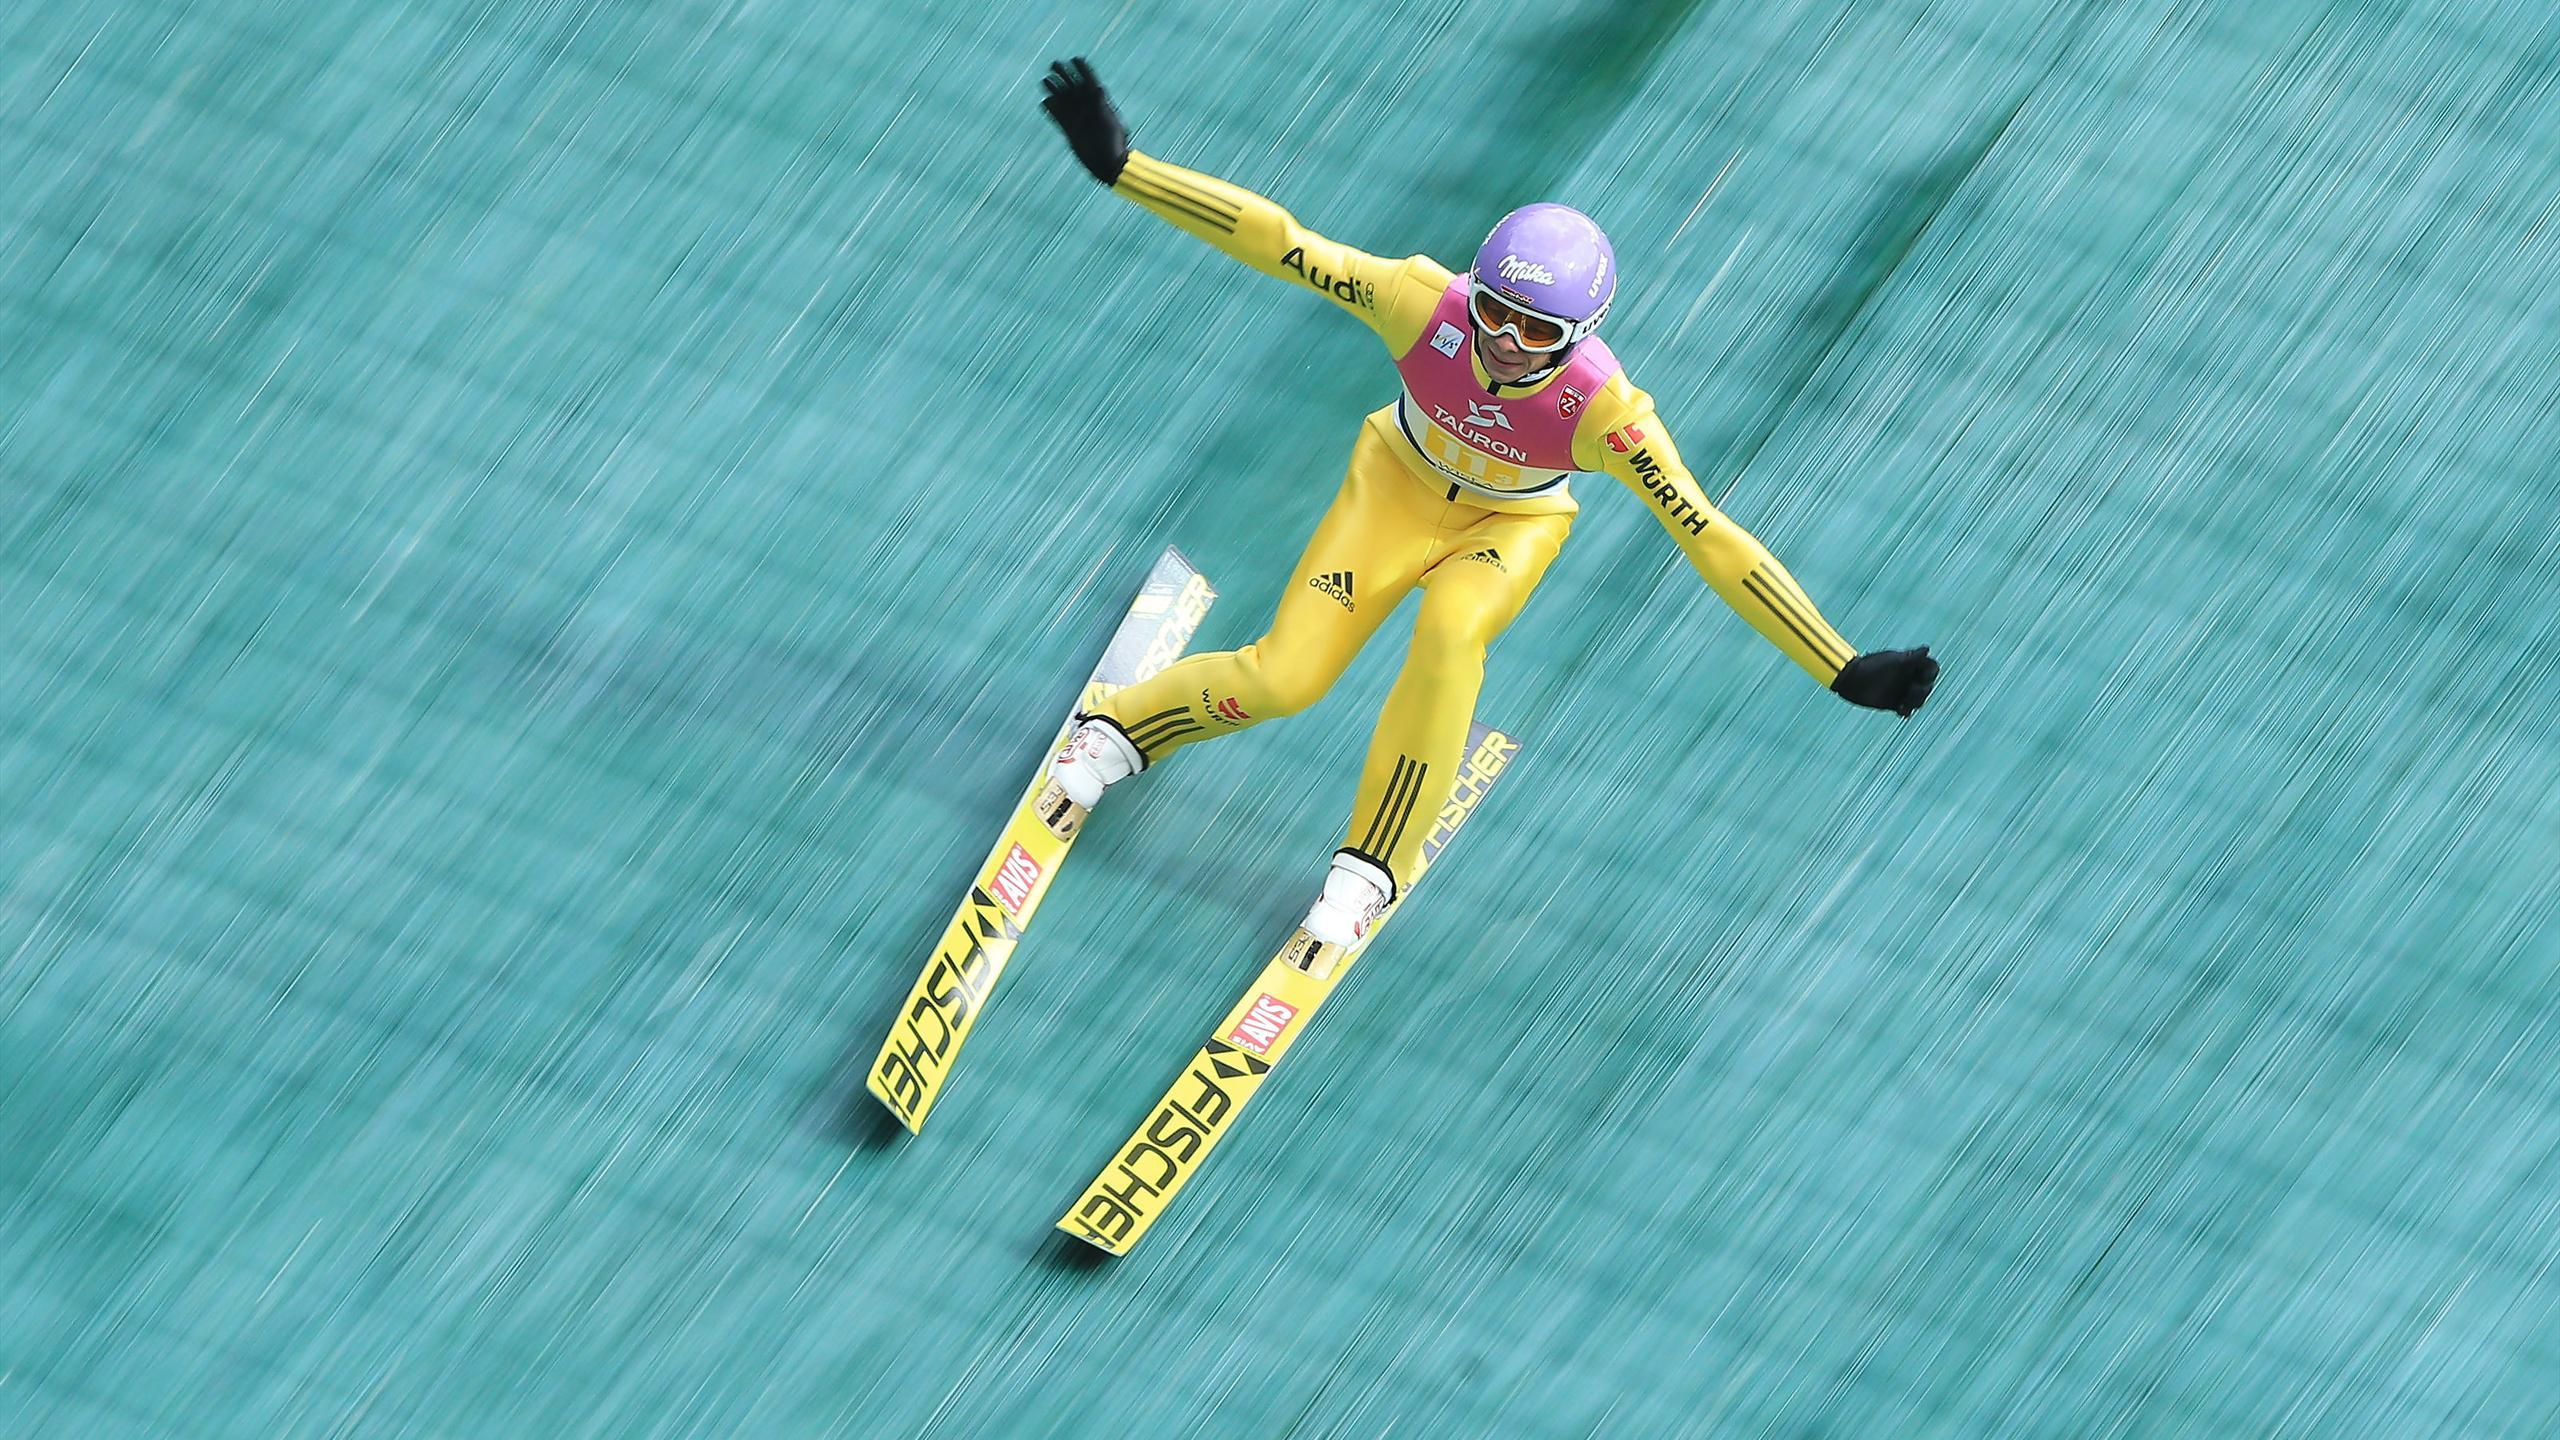 Eurosport Skispringen